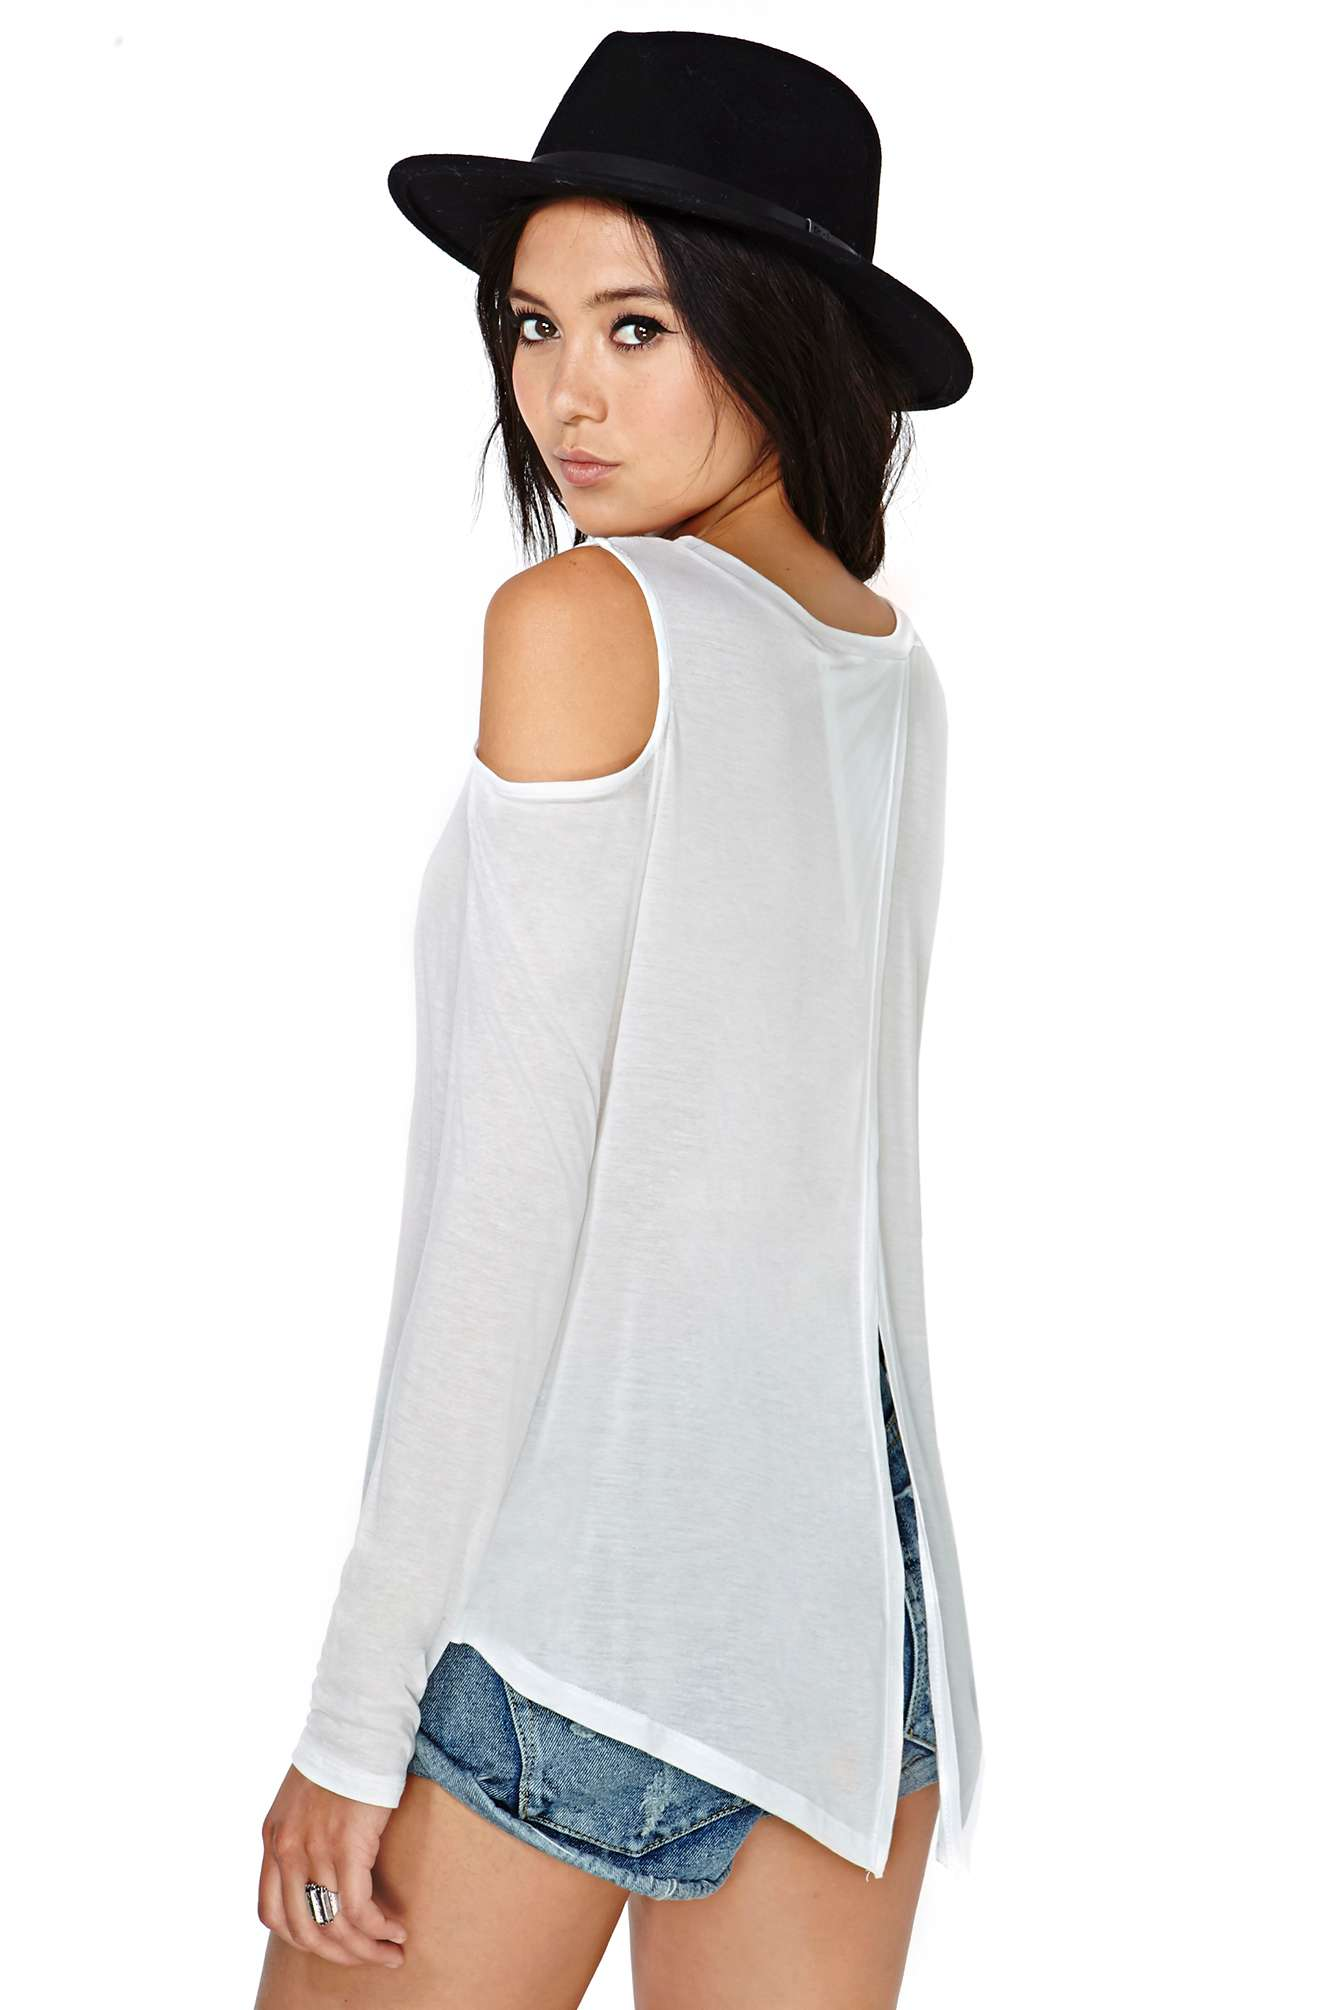 White Long Sleeve Cutout Shoulder Wrap Back T-shirt - Sheinside.com